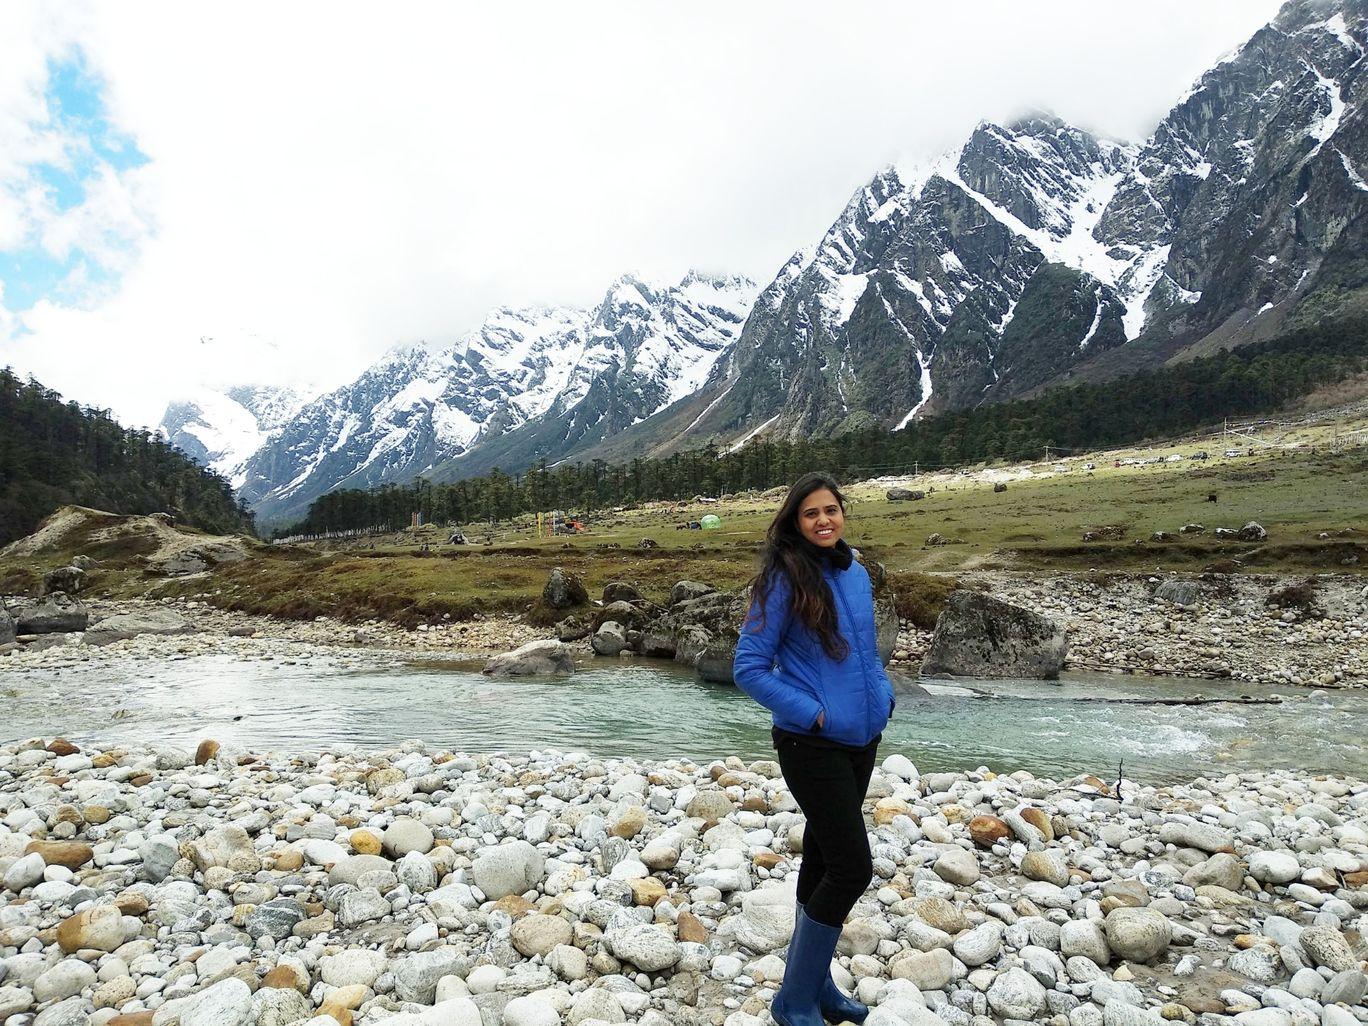 Photo of Yumthang By Prapti Vikas Khandelwal